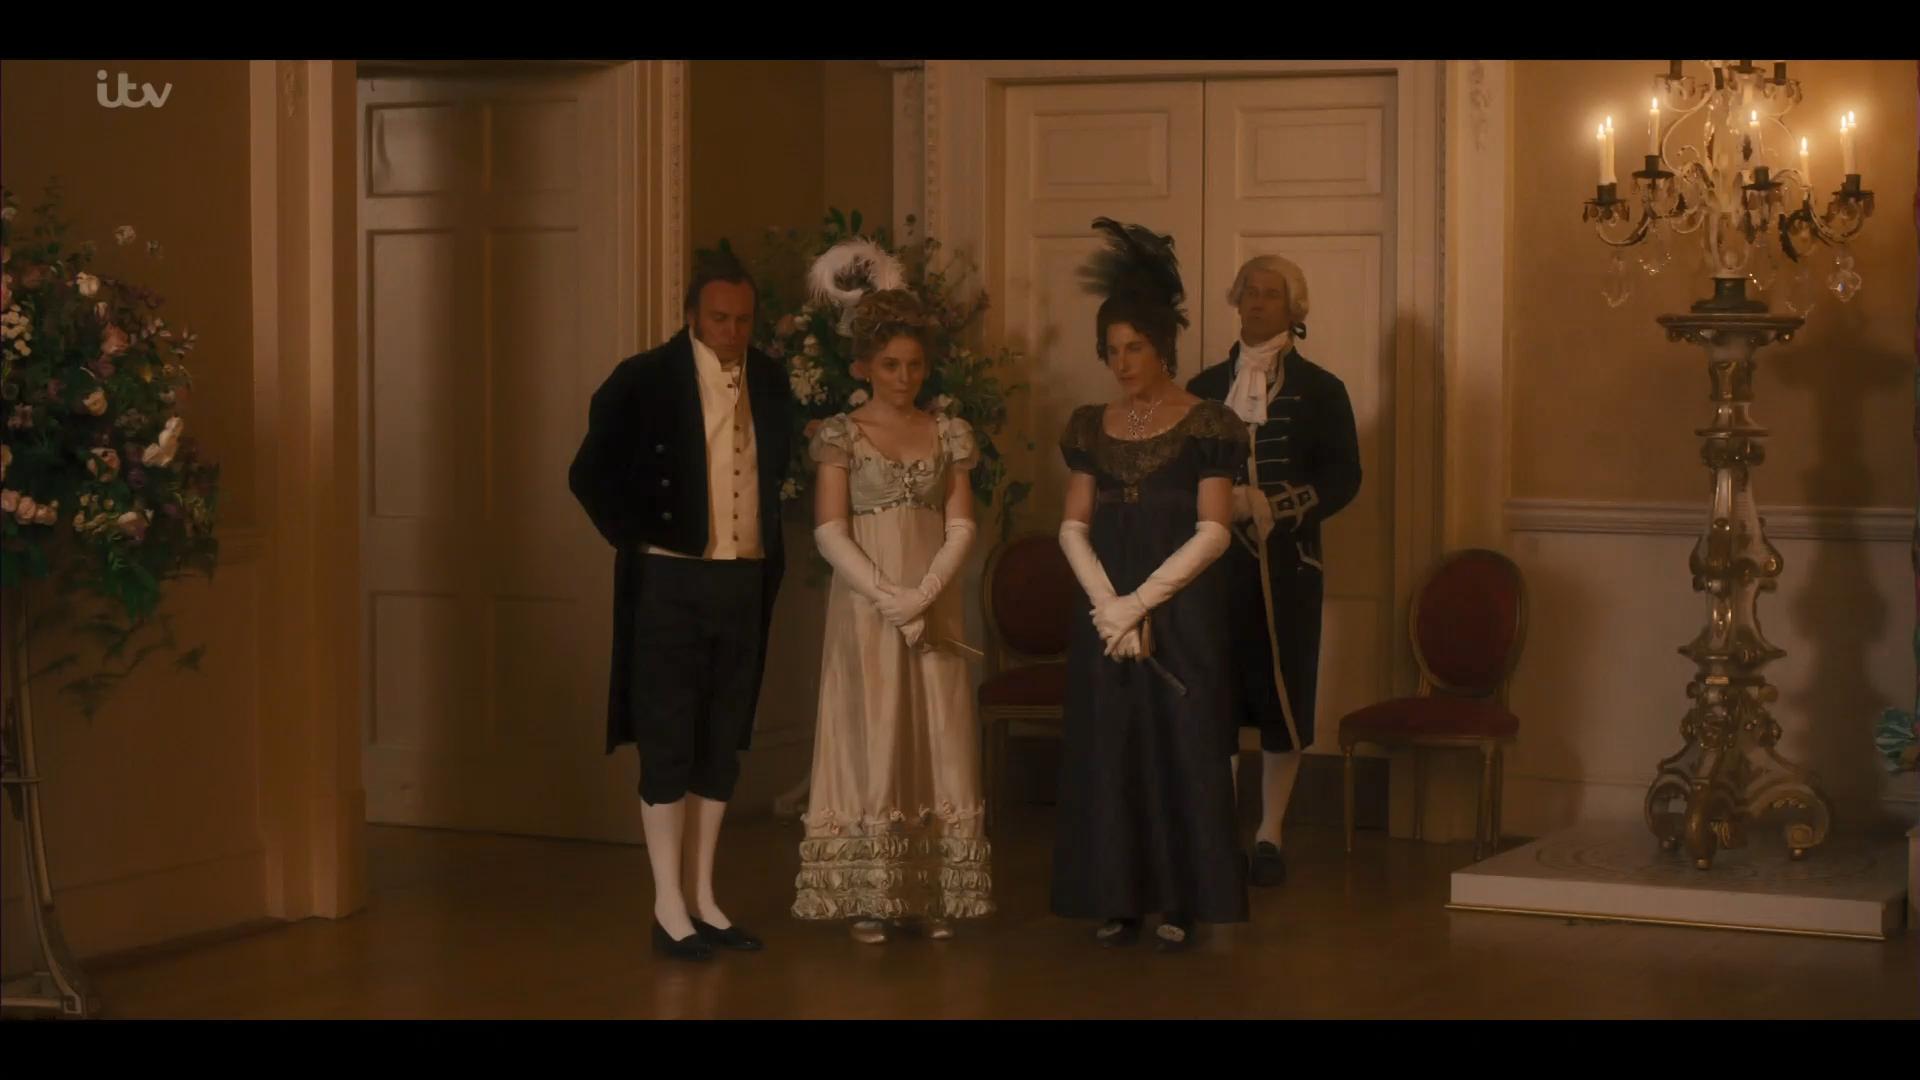 Белгравия (1 сезон: 1-6 серия из 6) (2020) HDTVRip 1080p | OMSKBIRD